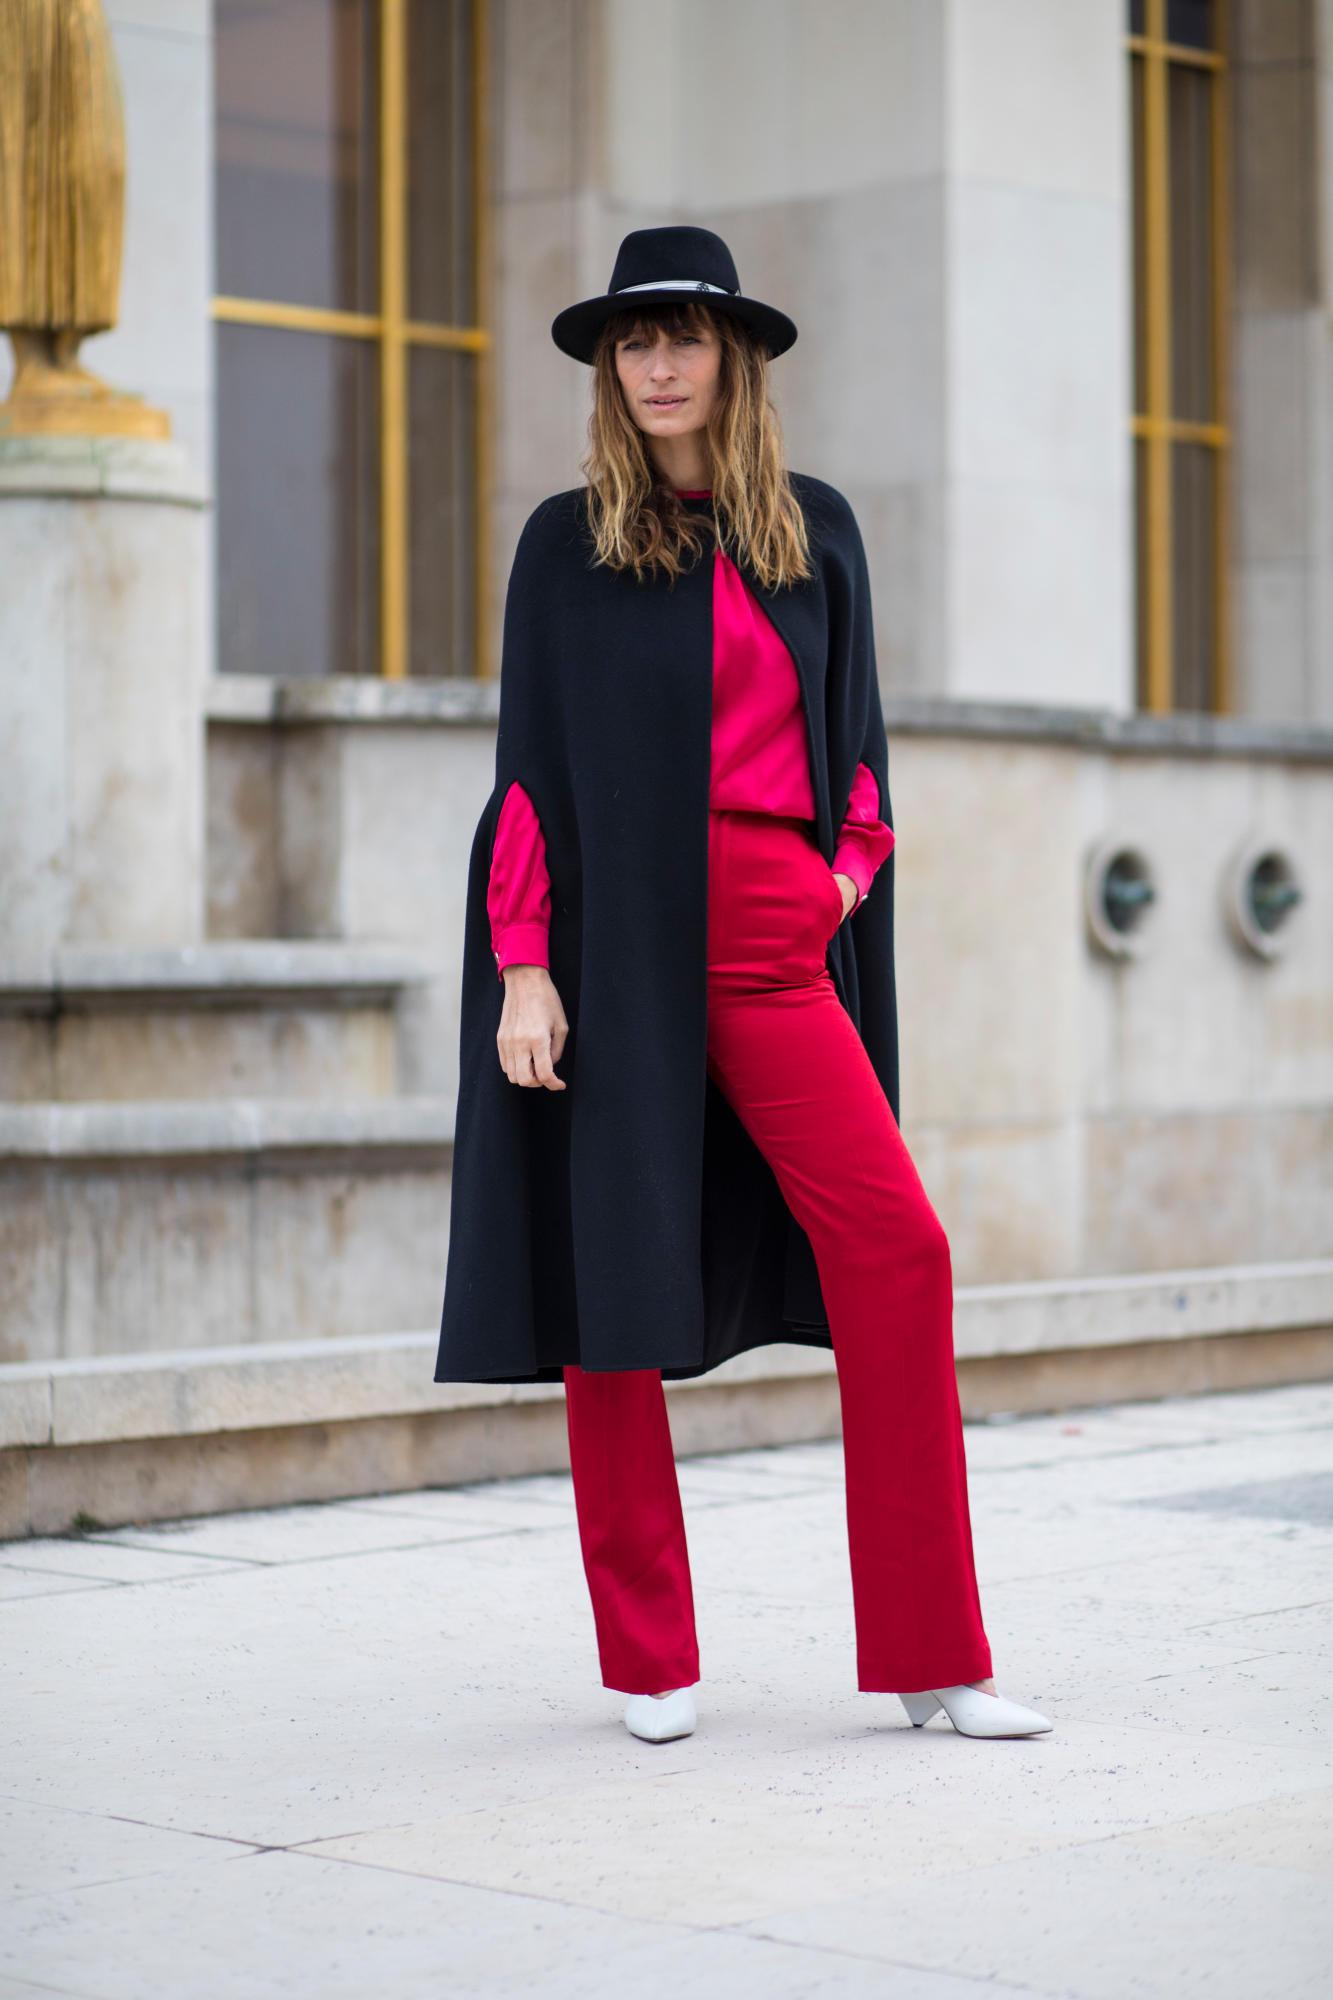 paris-fashion-week-street-style-fall-2018-day-5-5.jpg